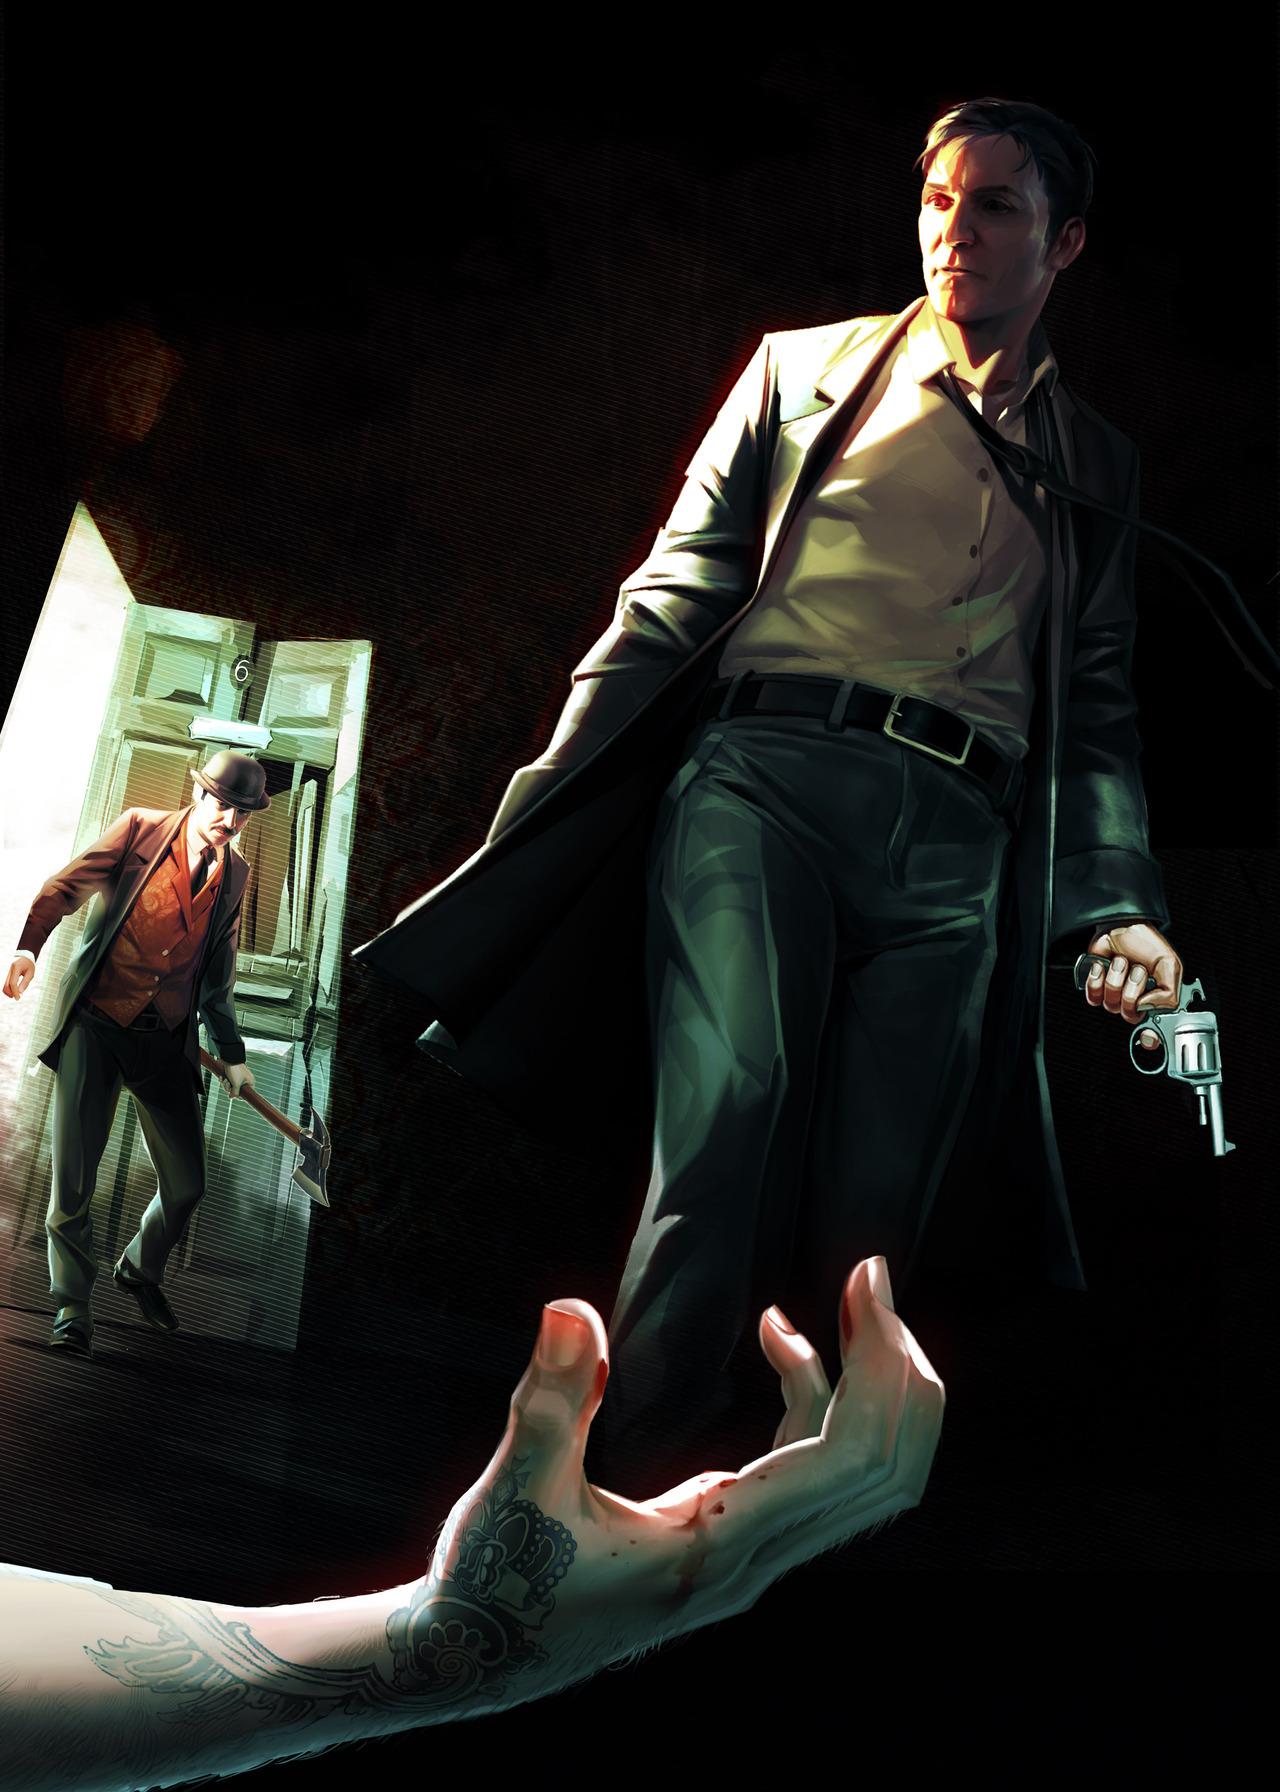 sherlock-holmes-crimes-punishments-playstation-4-ps4-1409213487-016.jpg